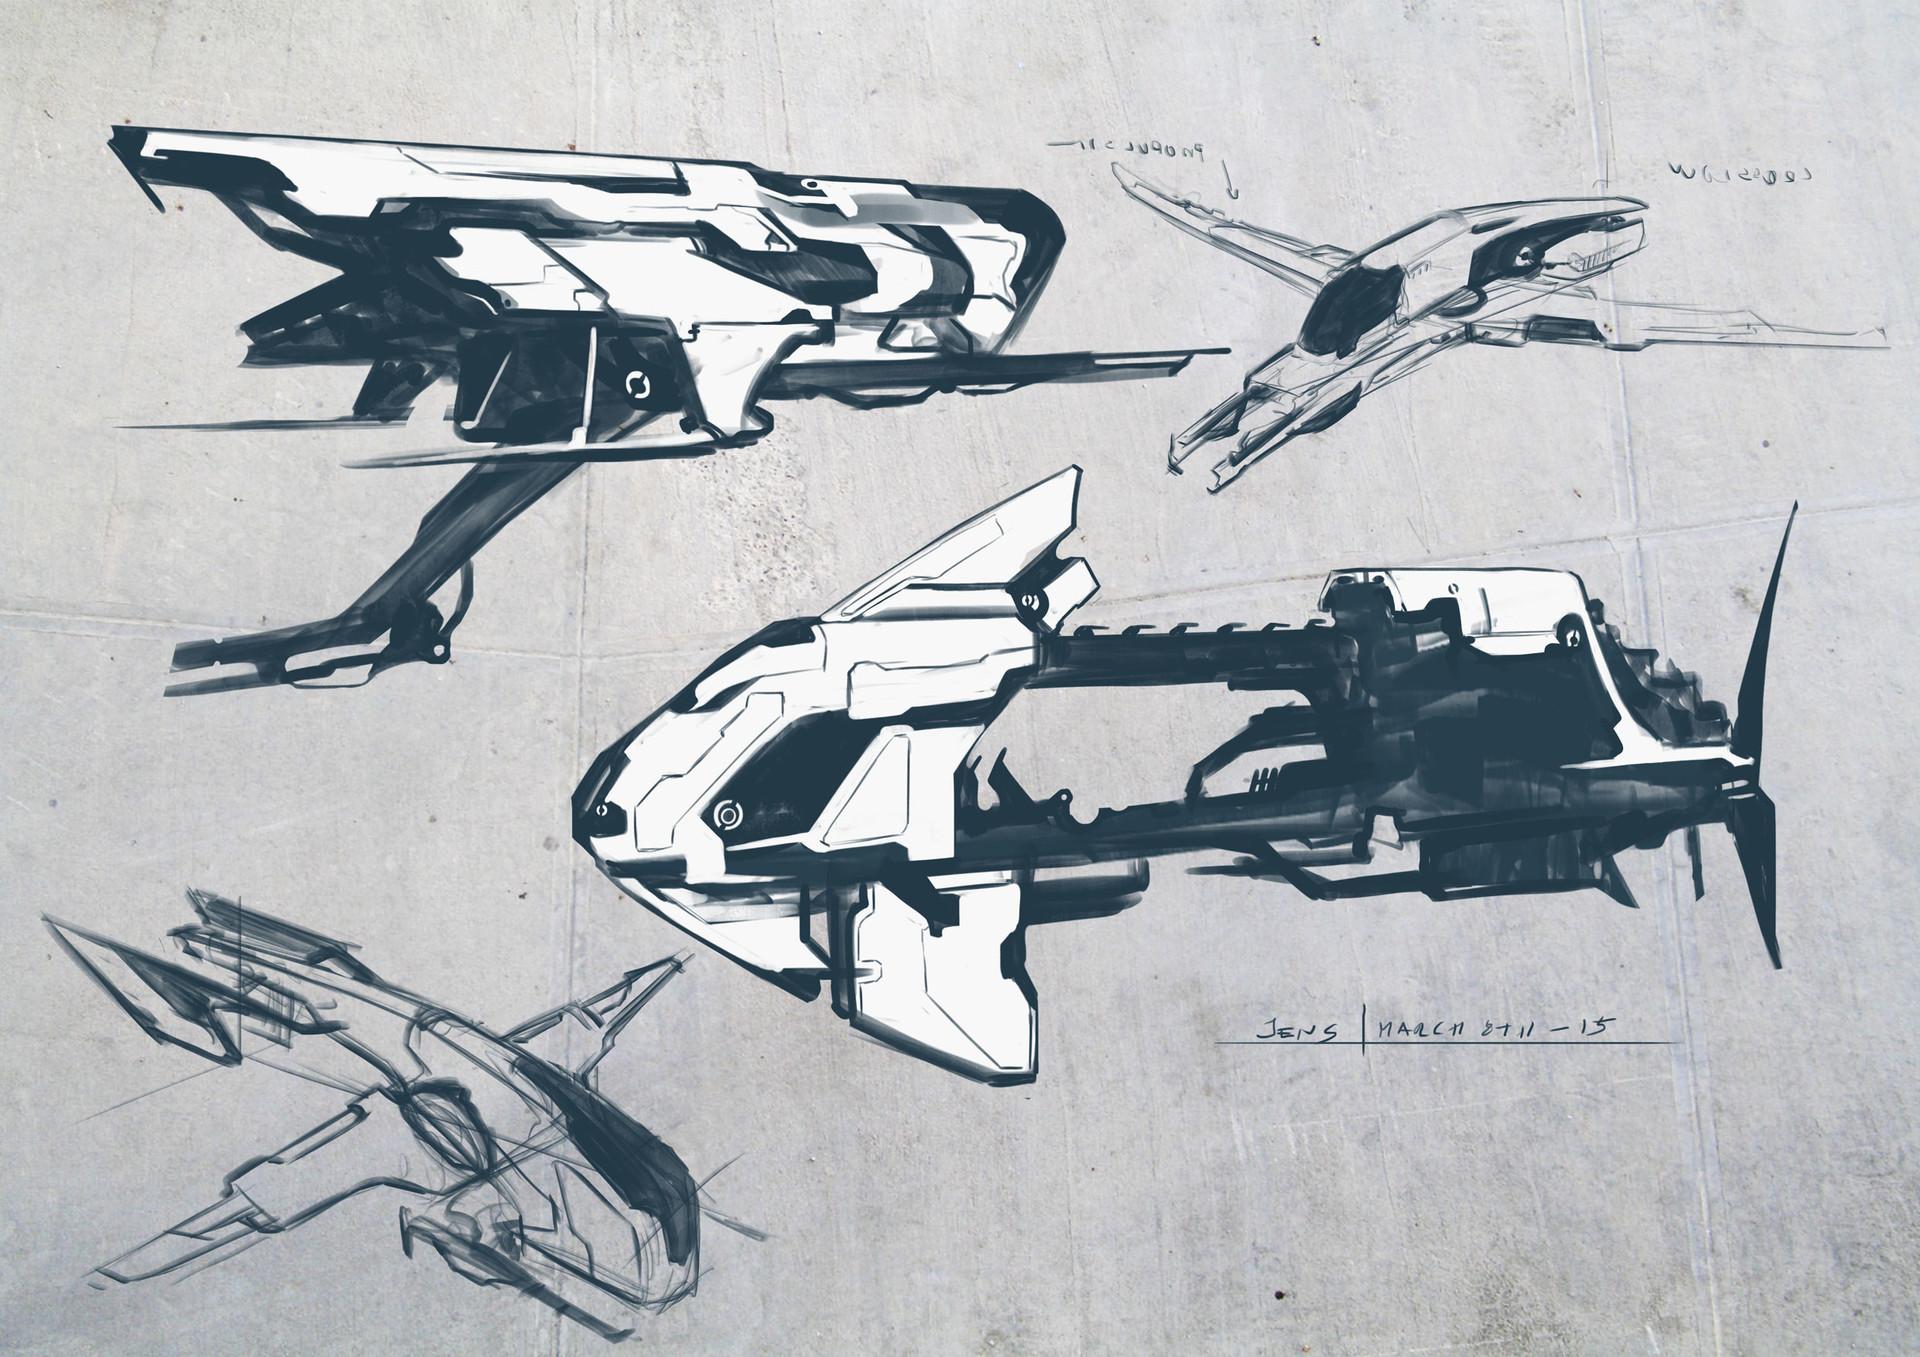 Jens bengtsson spaceships 01